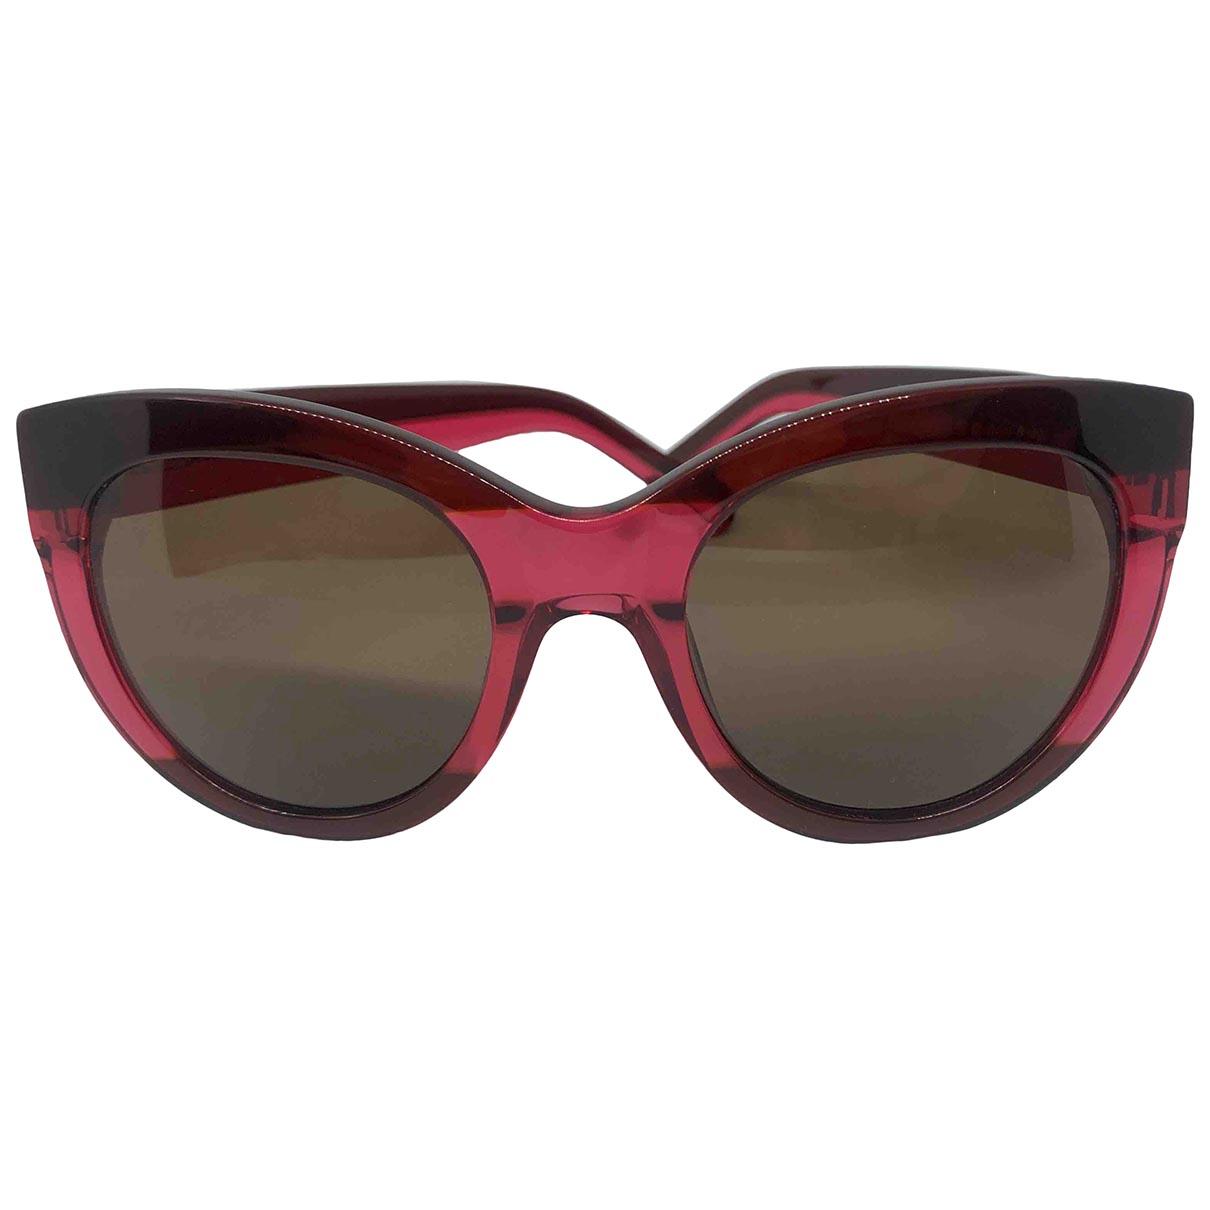 Sonia Rykiel \N Red Sunglasses for Women \N